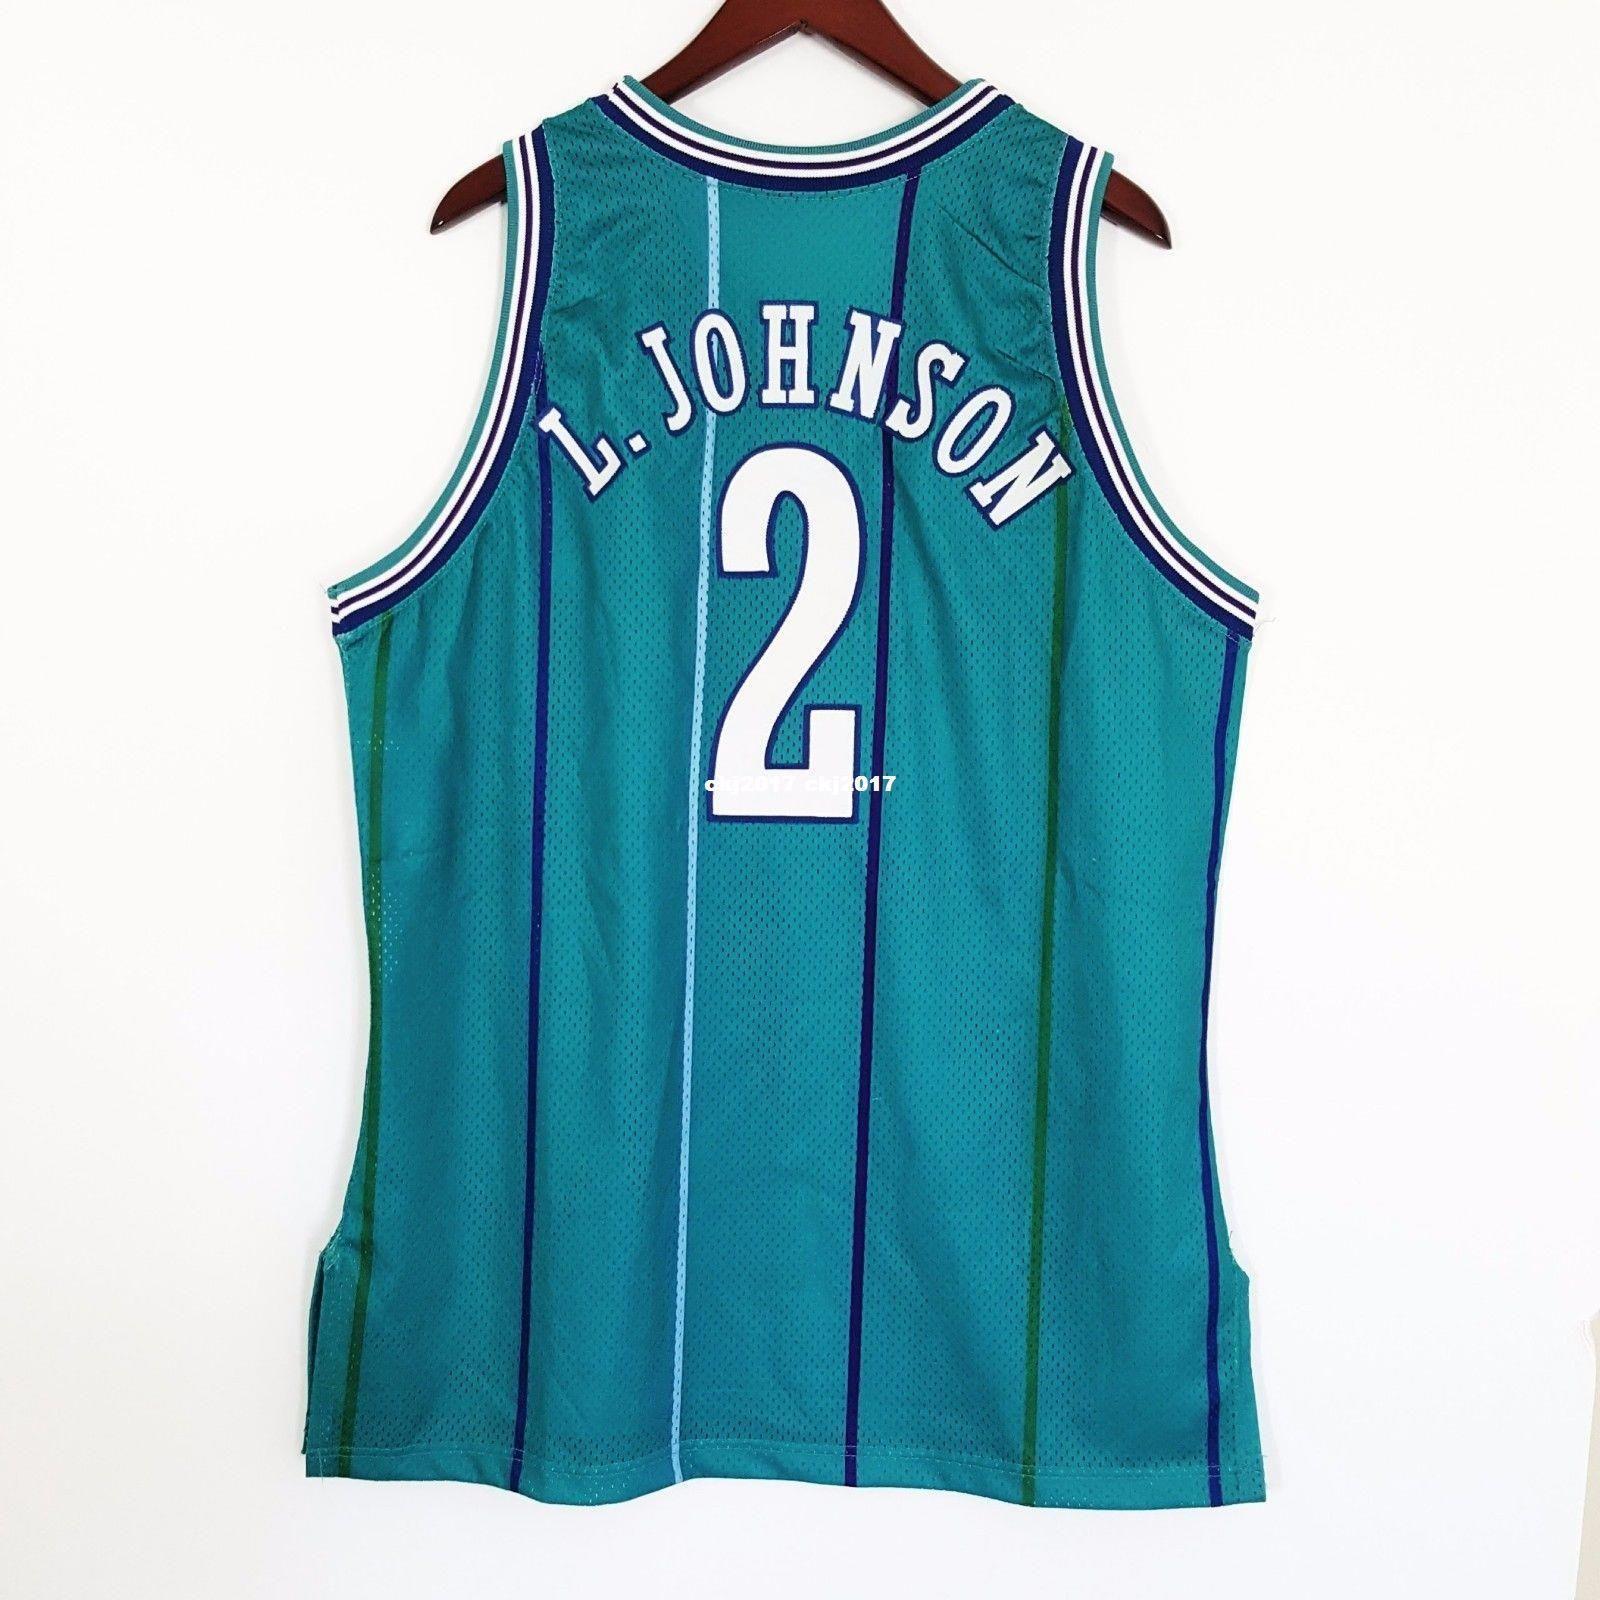 los angeles d0c05 8e509 100% Stitched Larry Johnson HorSewn Champion Jersey ens Mens Vest Size  XS-6XL Stitched basketball Jerseys Ncaa